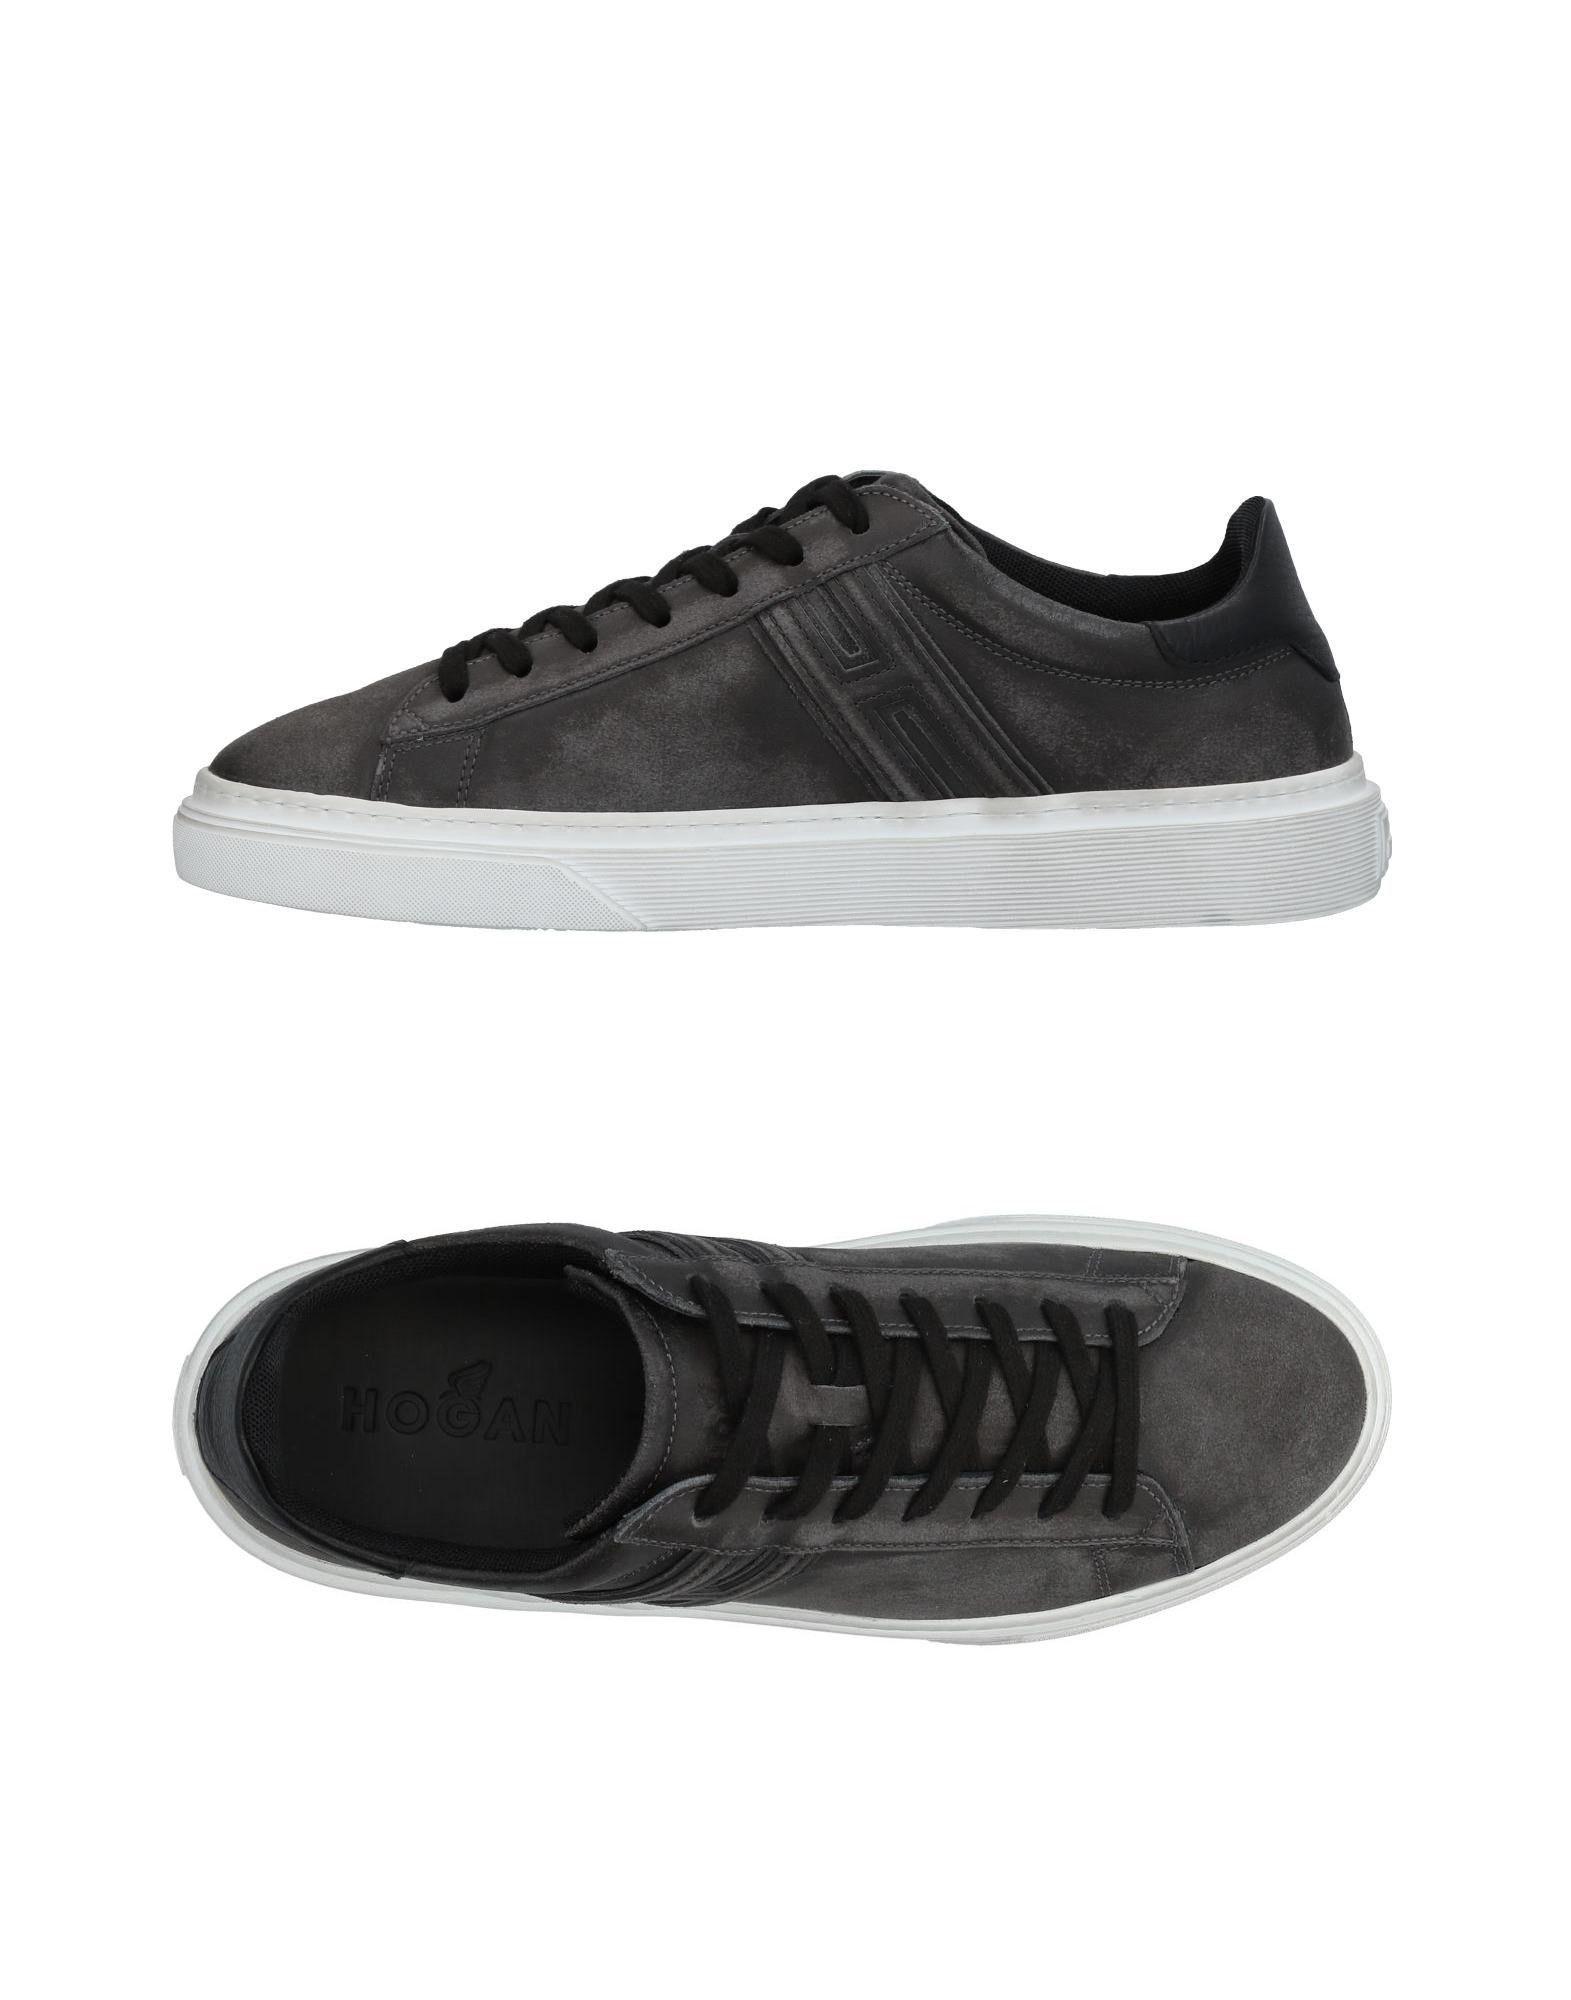 Hogan Sneakers Herren  11461697TC Gute Qualität beliebte Schuhe